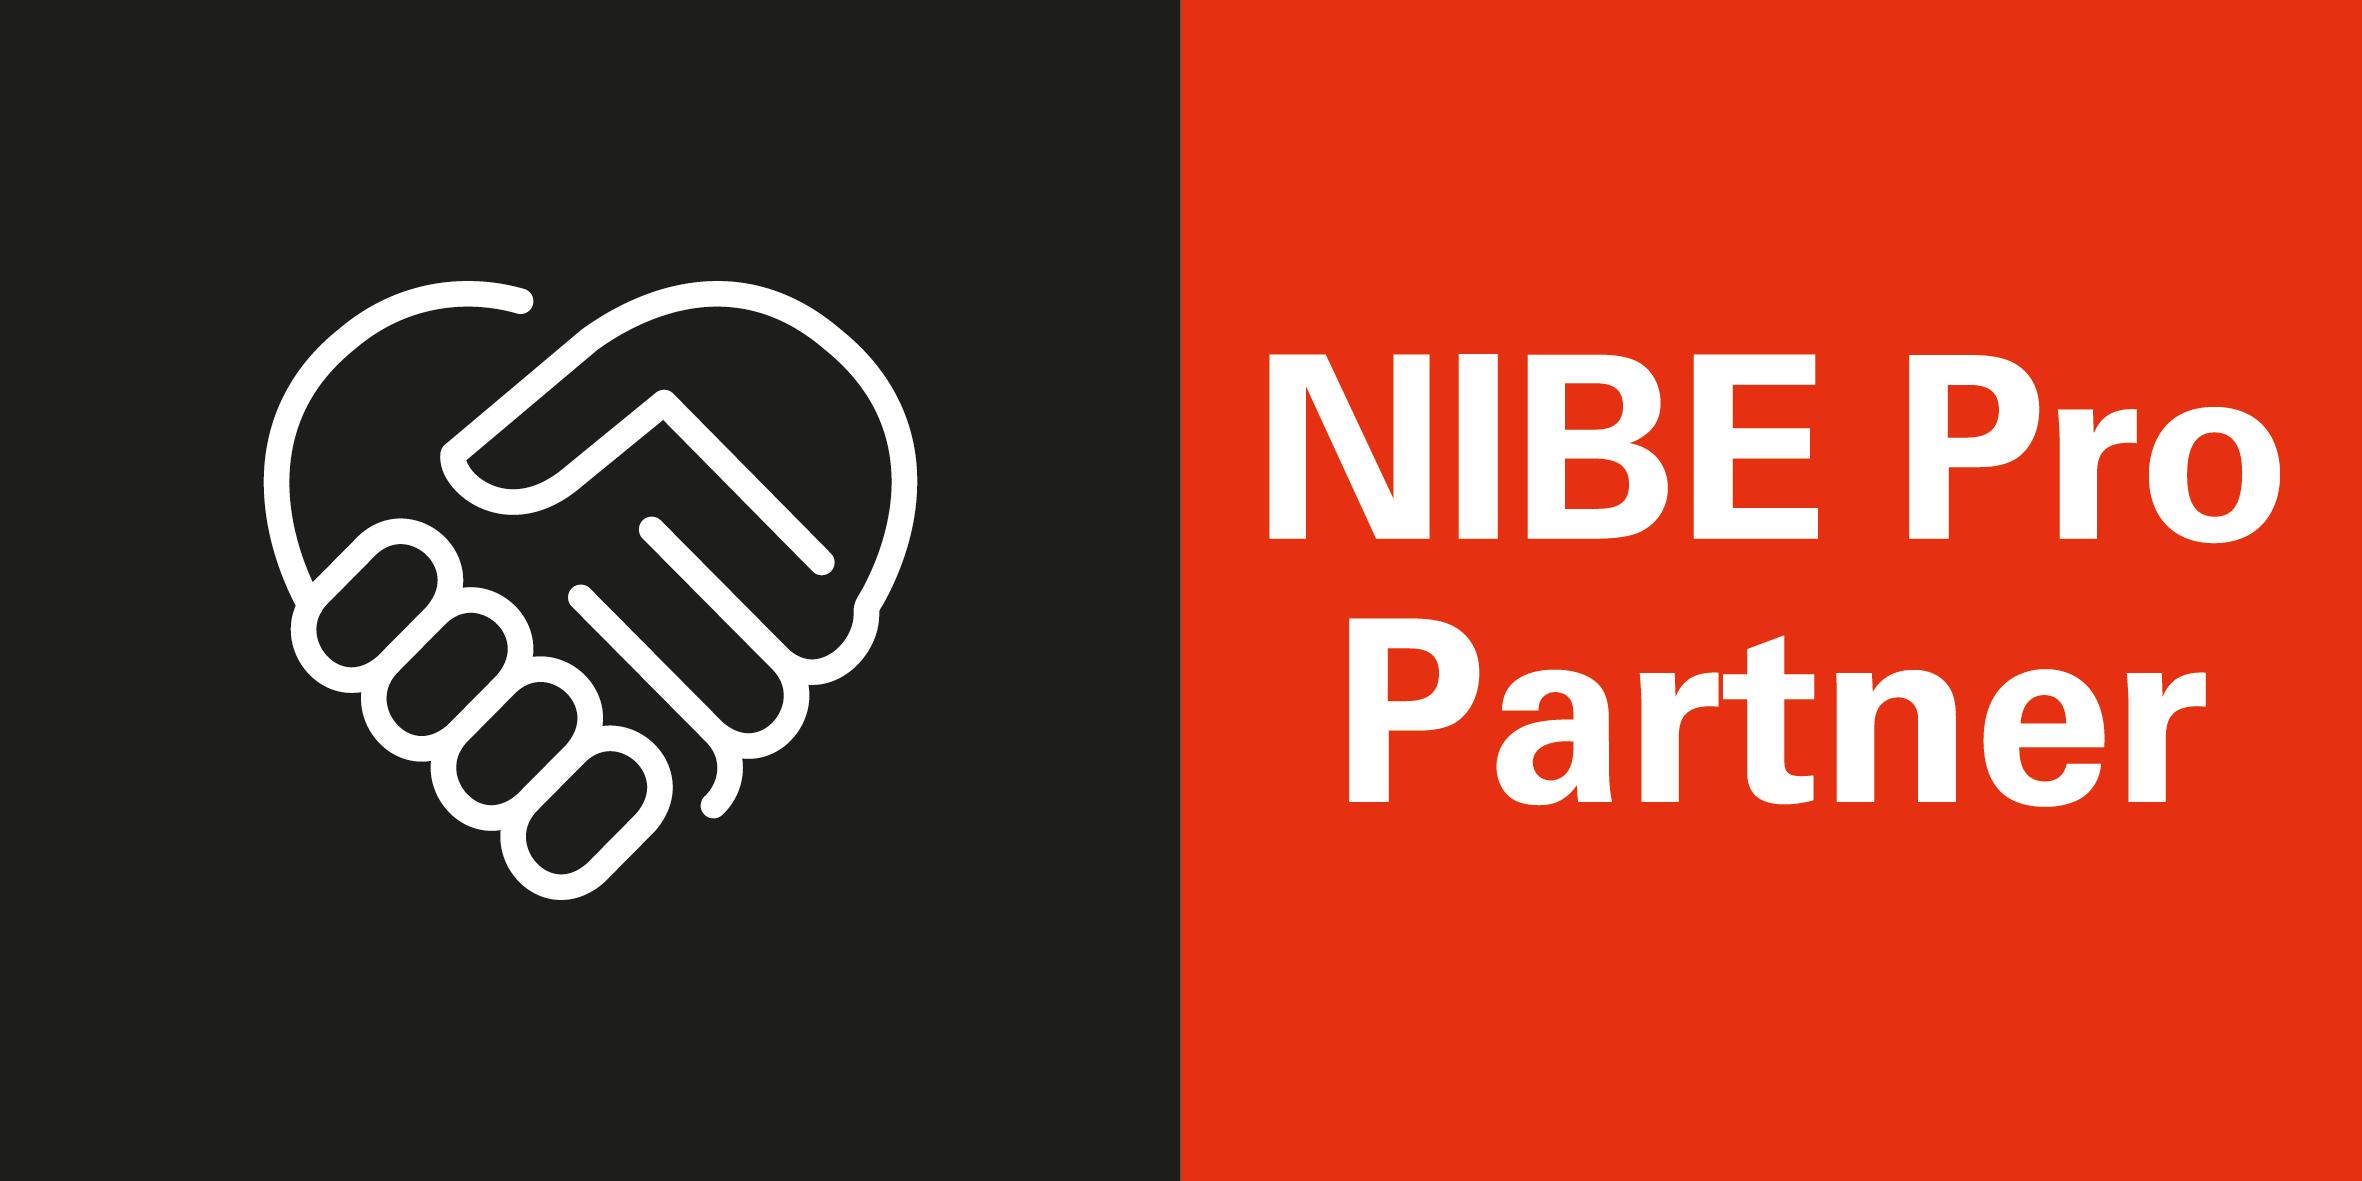 NIBE Pro Partner